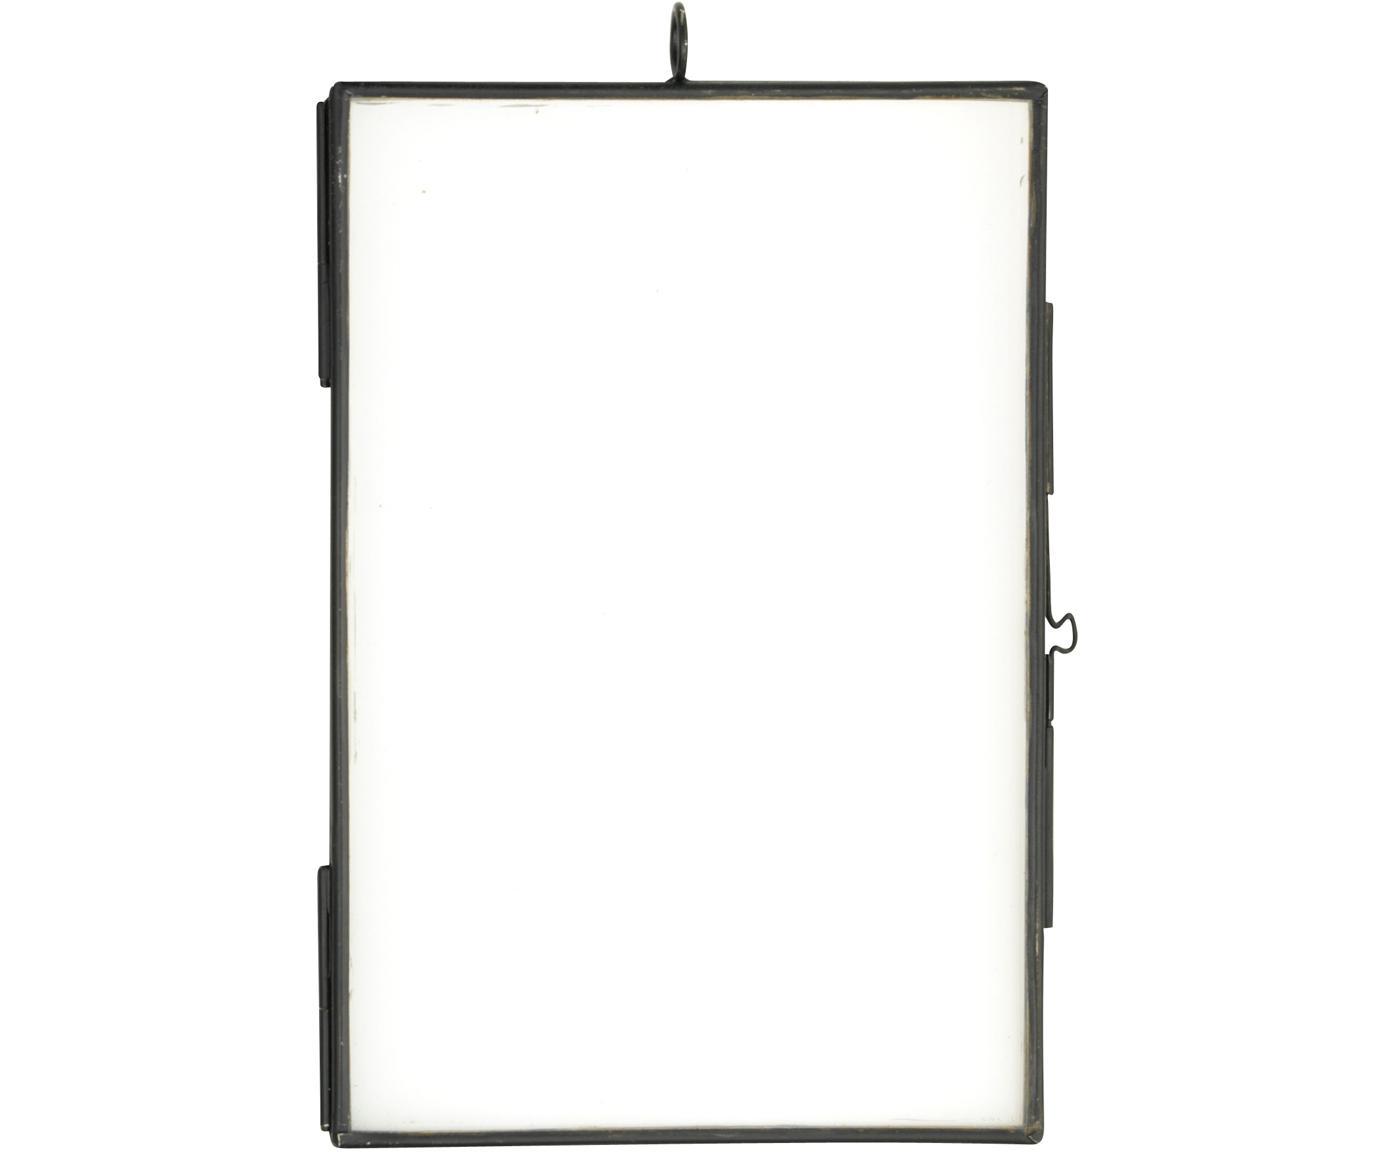 Marco Key, Vidrio, metal, recubierto, Negro, 10 x 15 cm